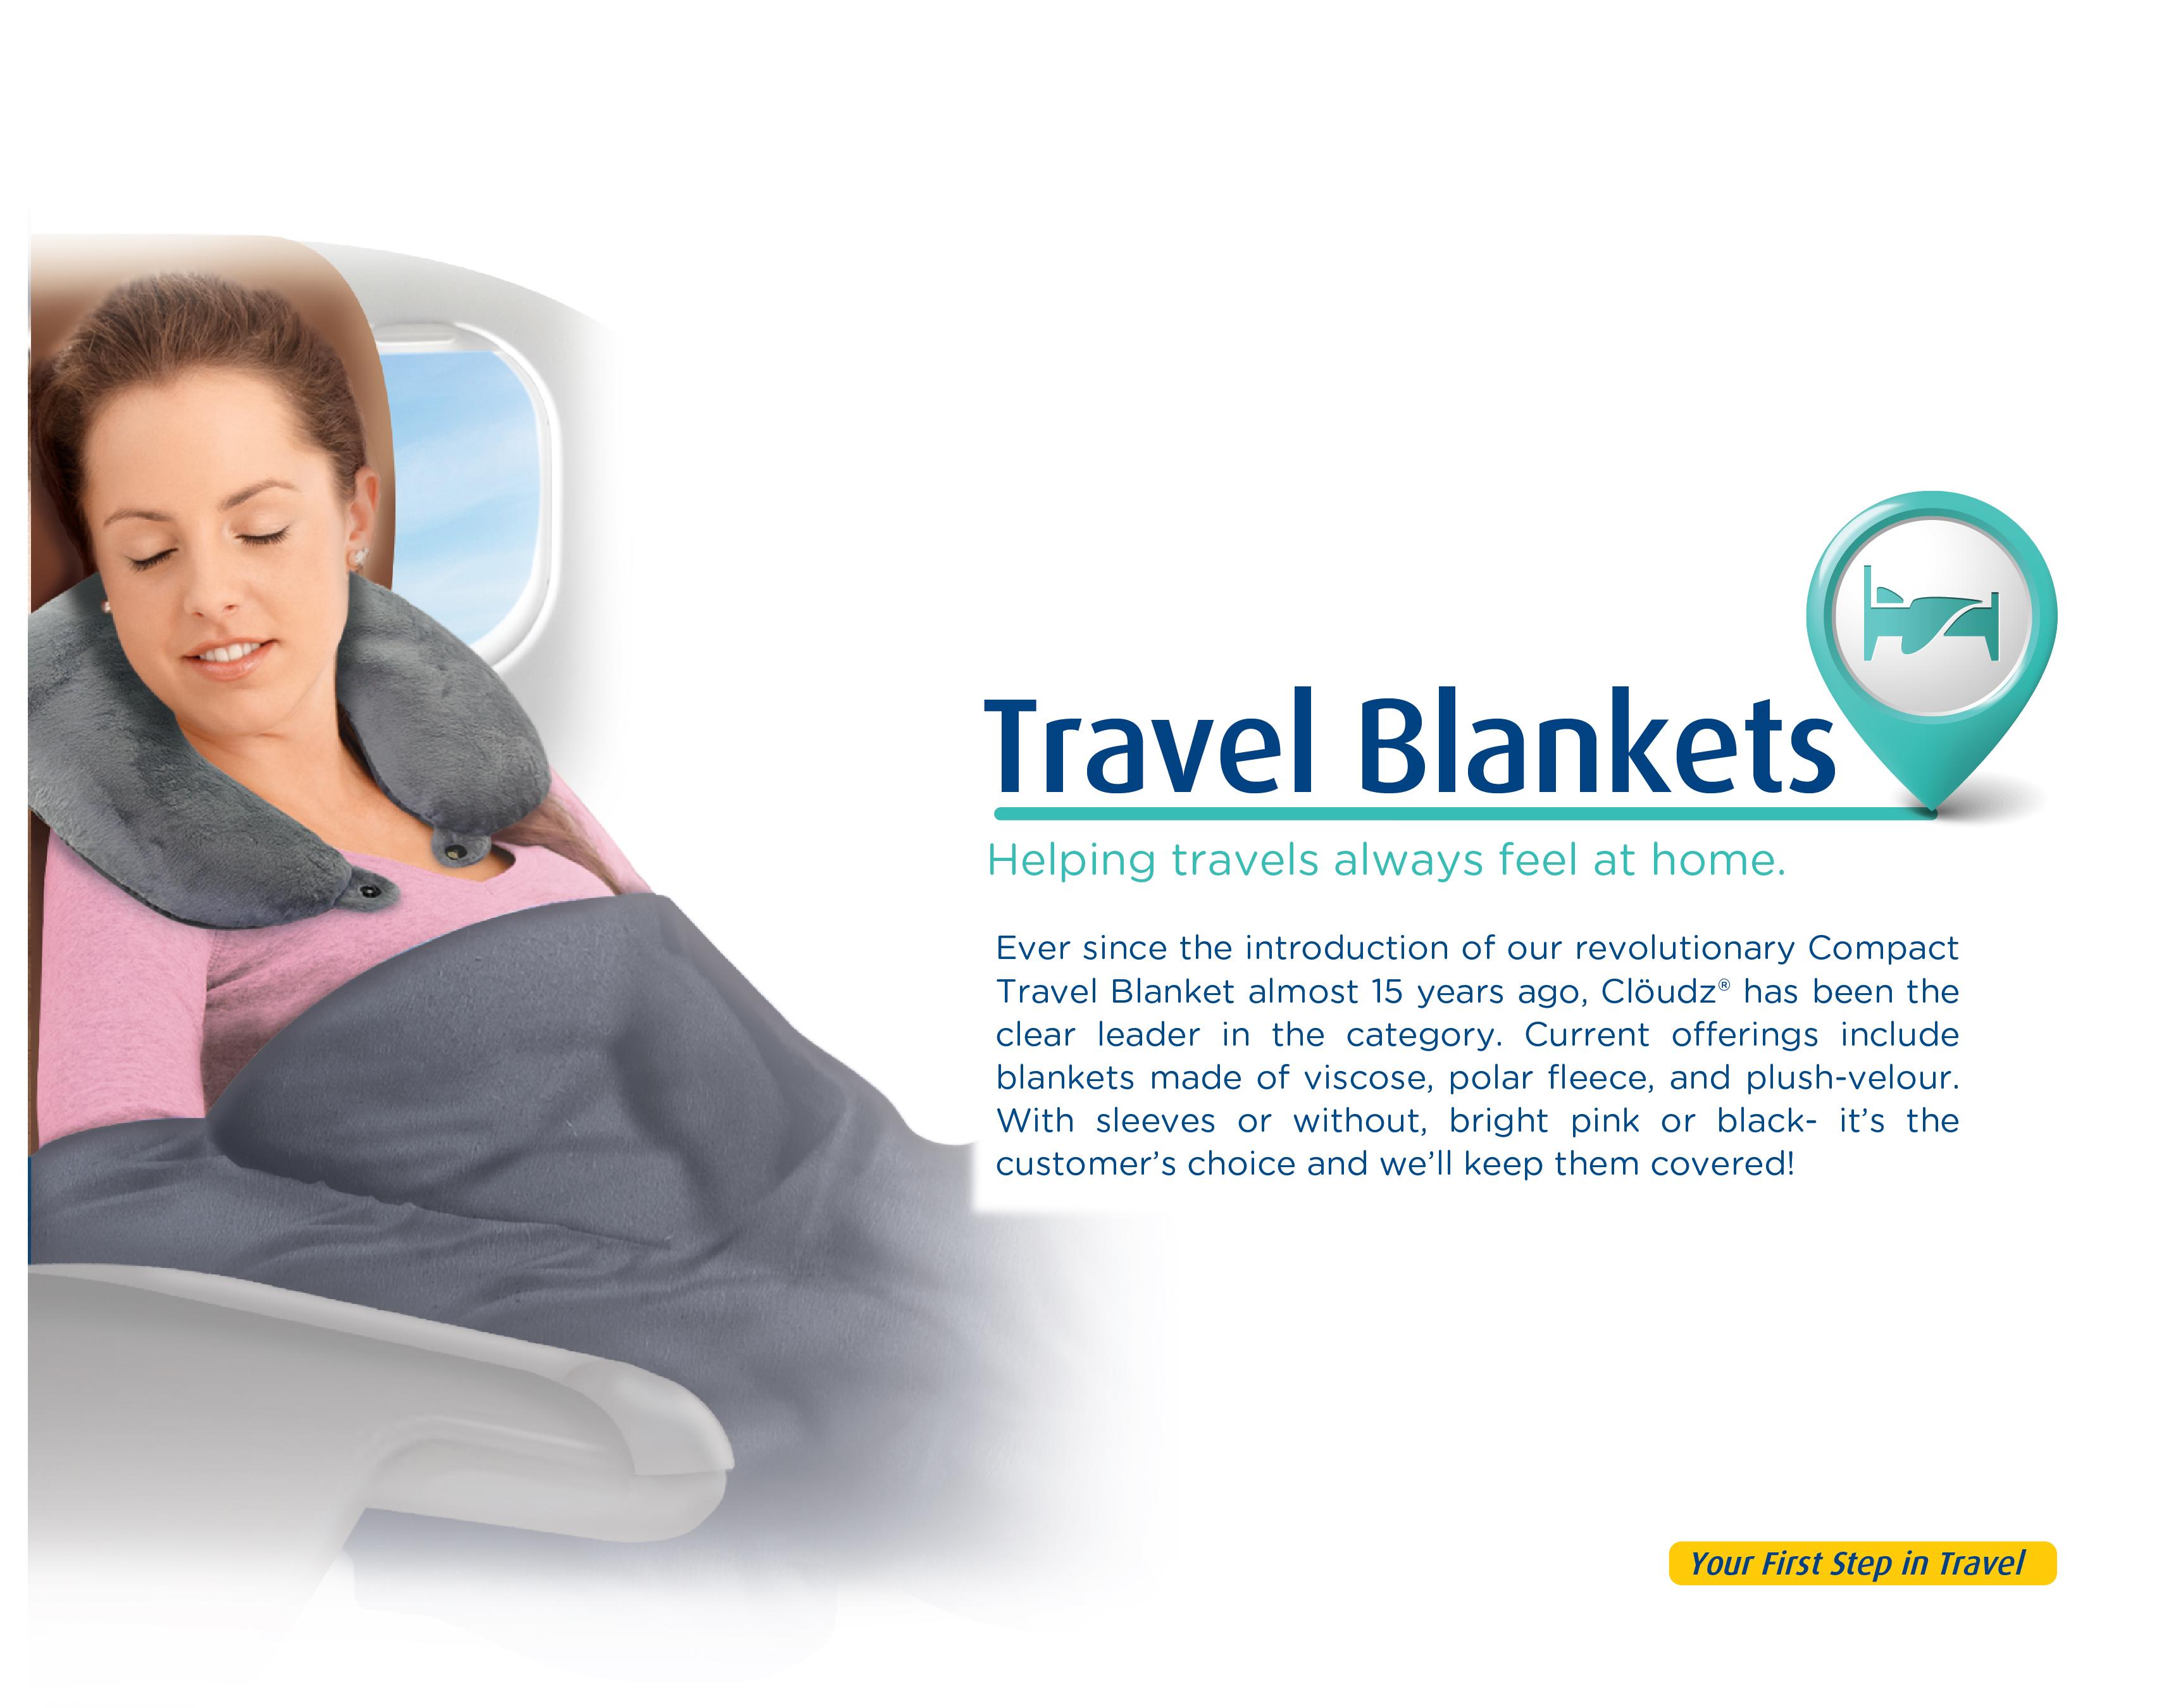 travel_blanket_section-01